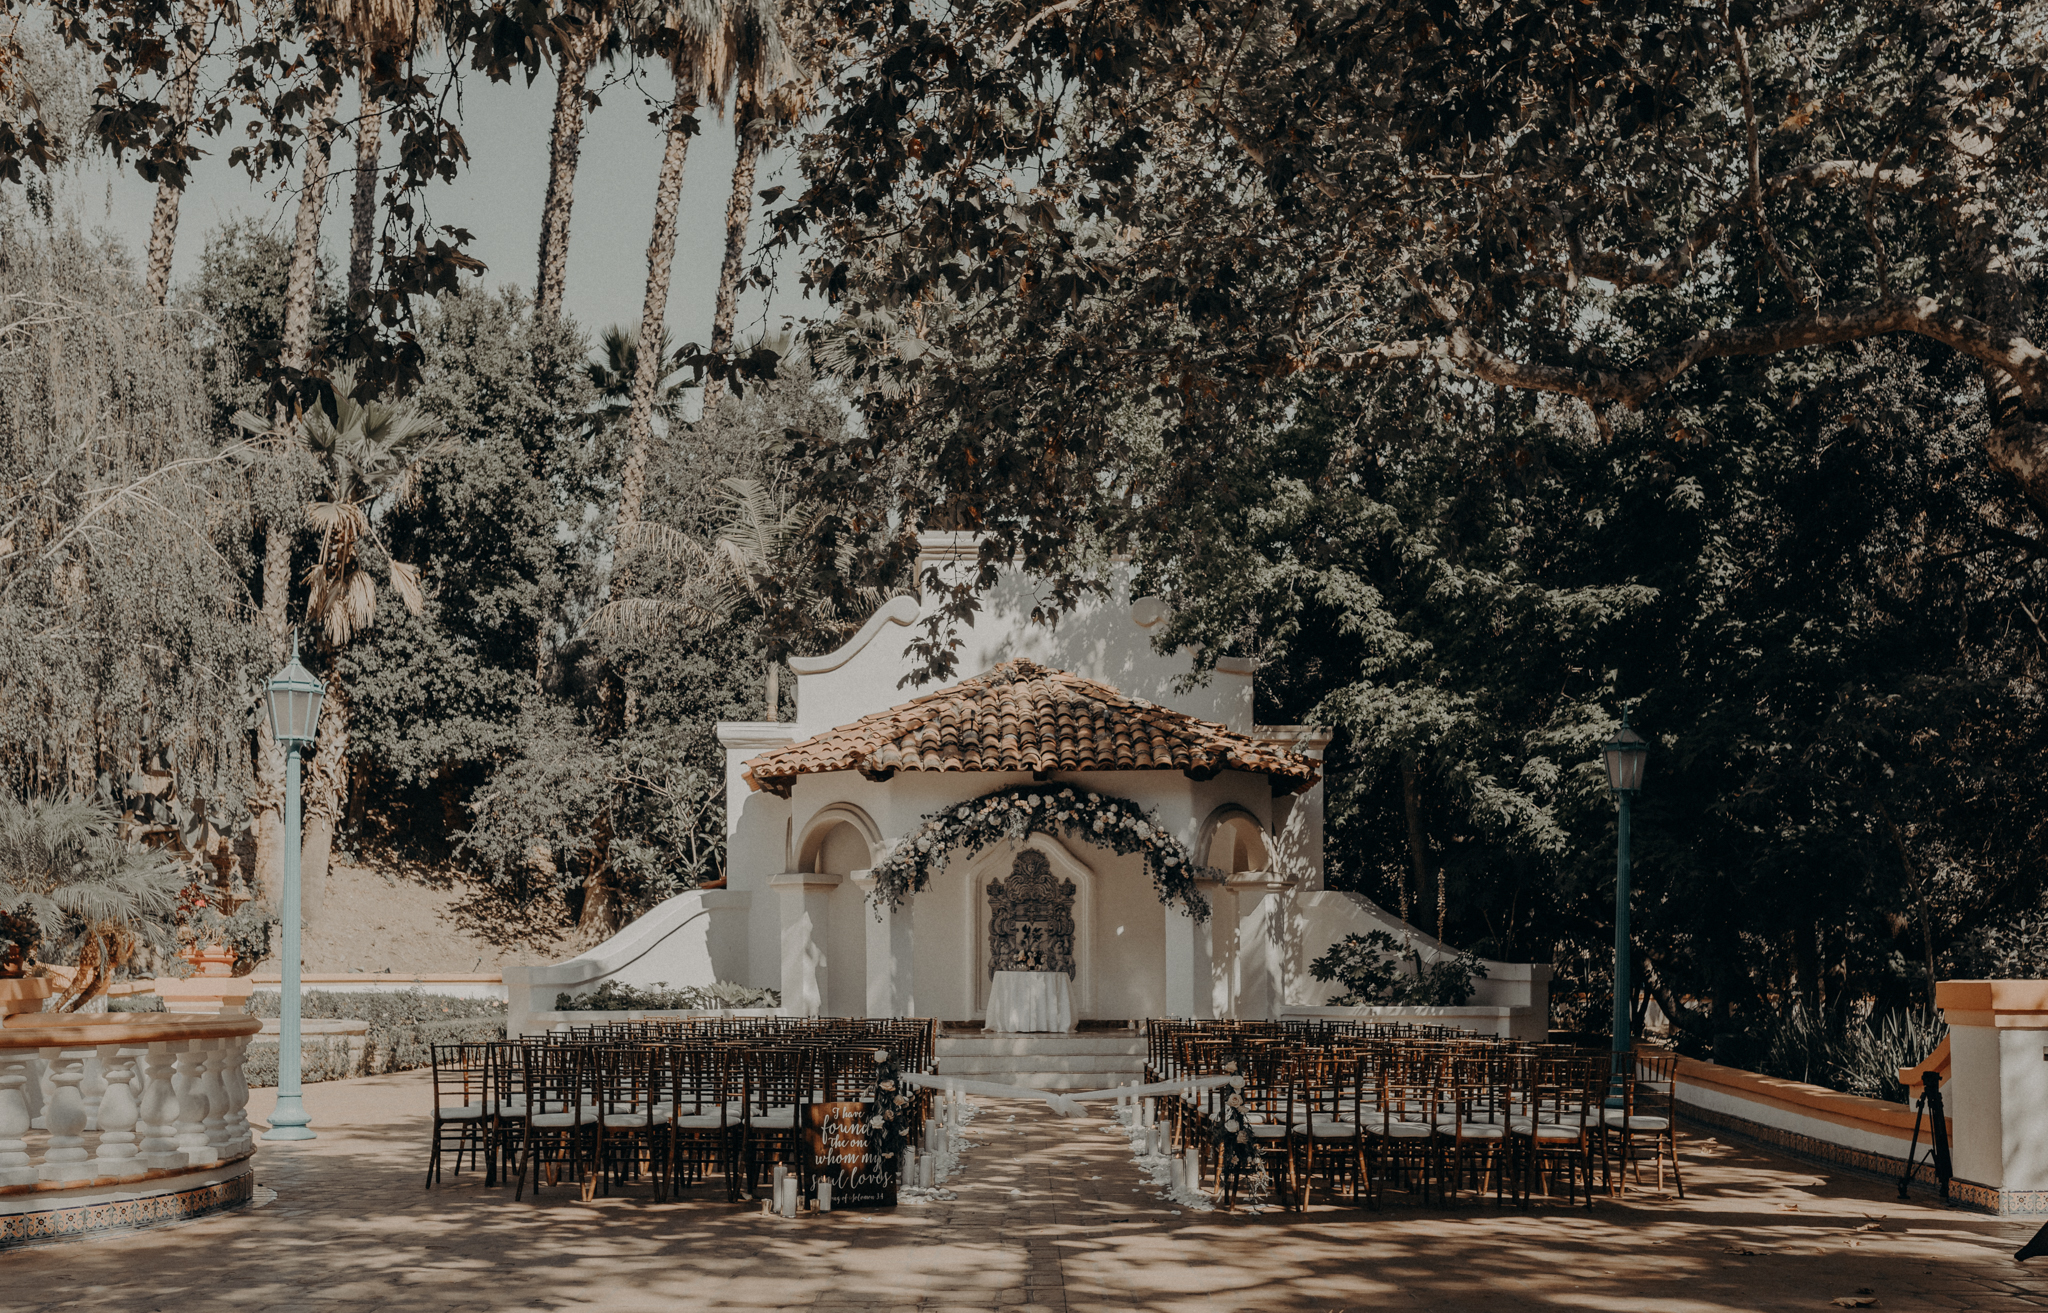 Isaiah + Taylor Photography - Rancho Las Lomas Wedding, Los Angeles Wedding Photographer-041.jpg